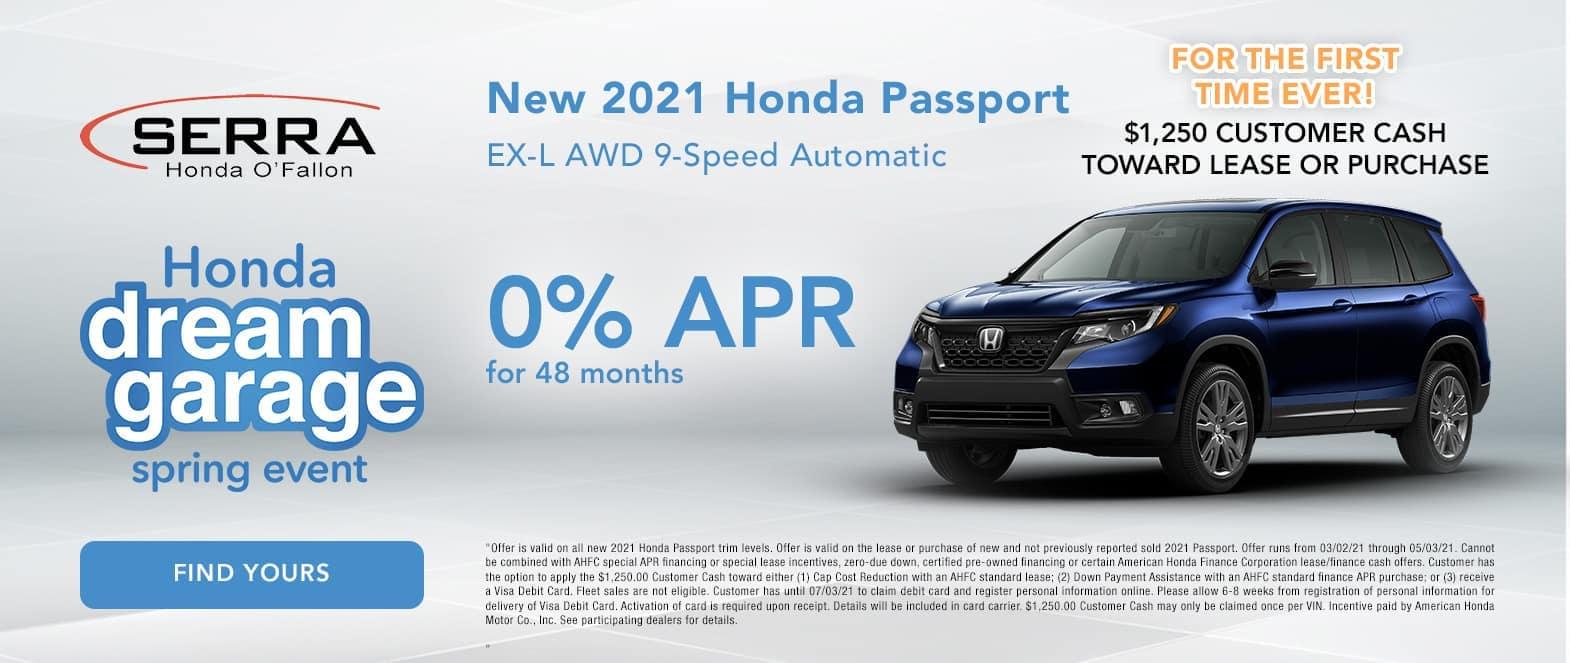 New Honda Passport Special